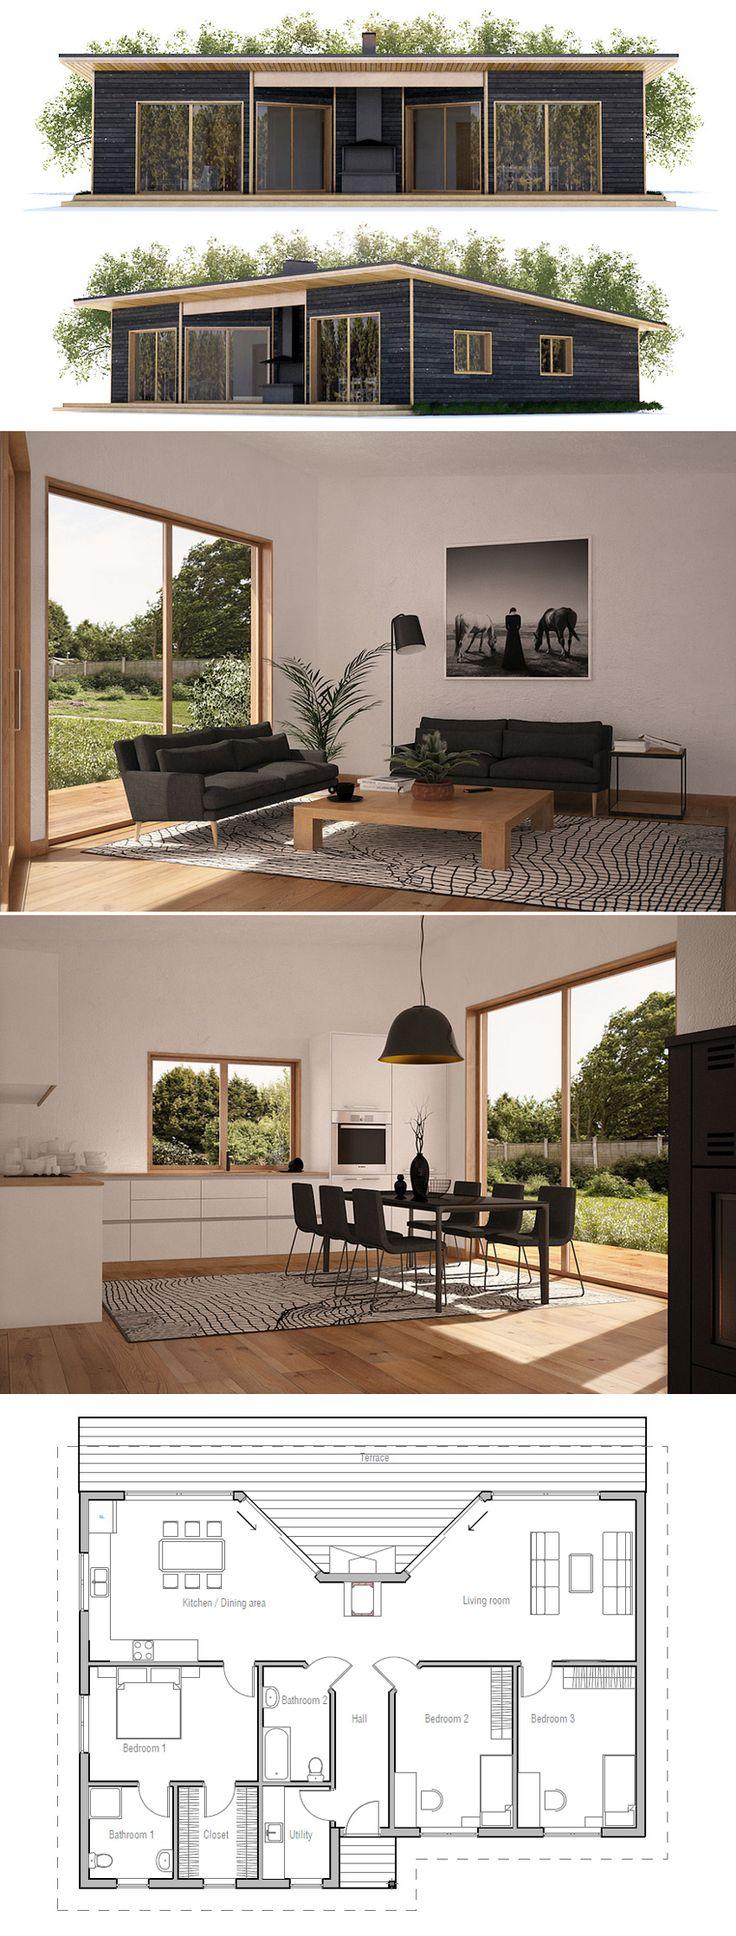 id e relooking cuisine plan de maison leading inspiration culture. Black Bedroom Furniture Sets. Home Design Ideas